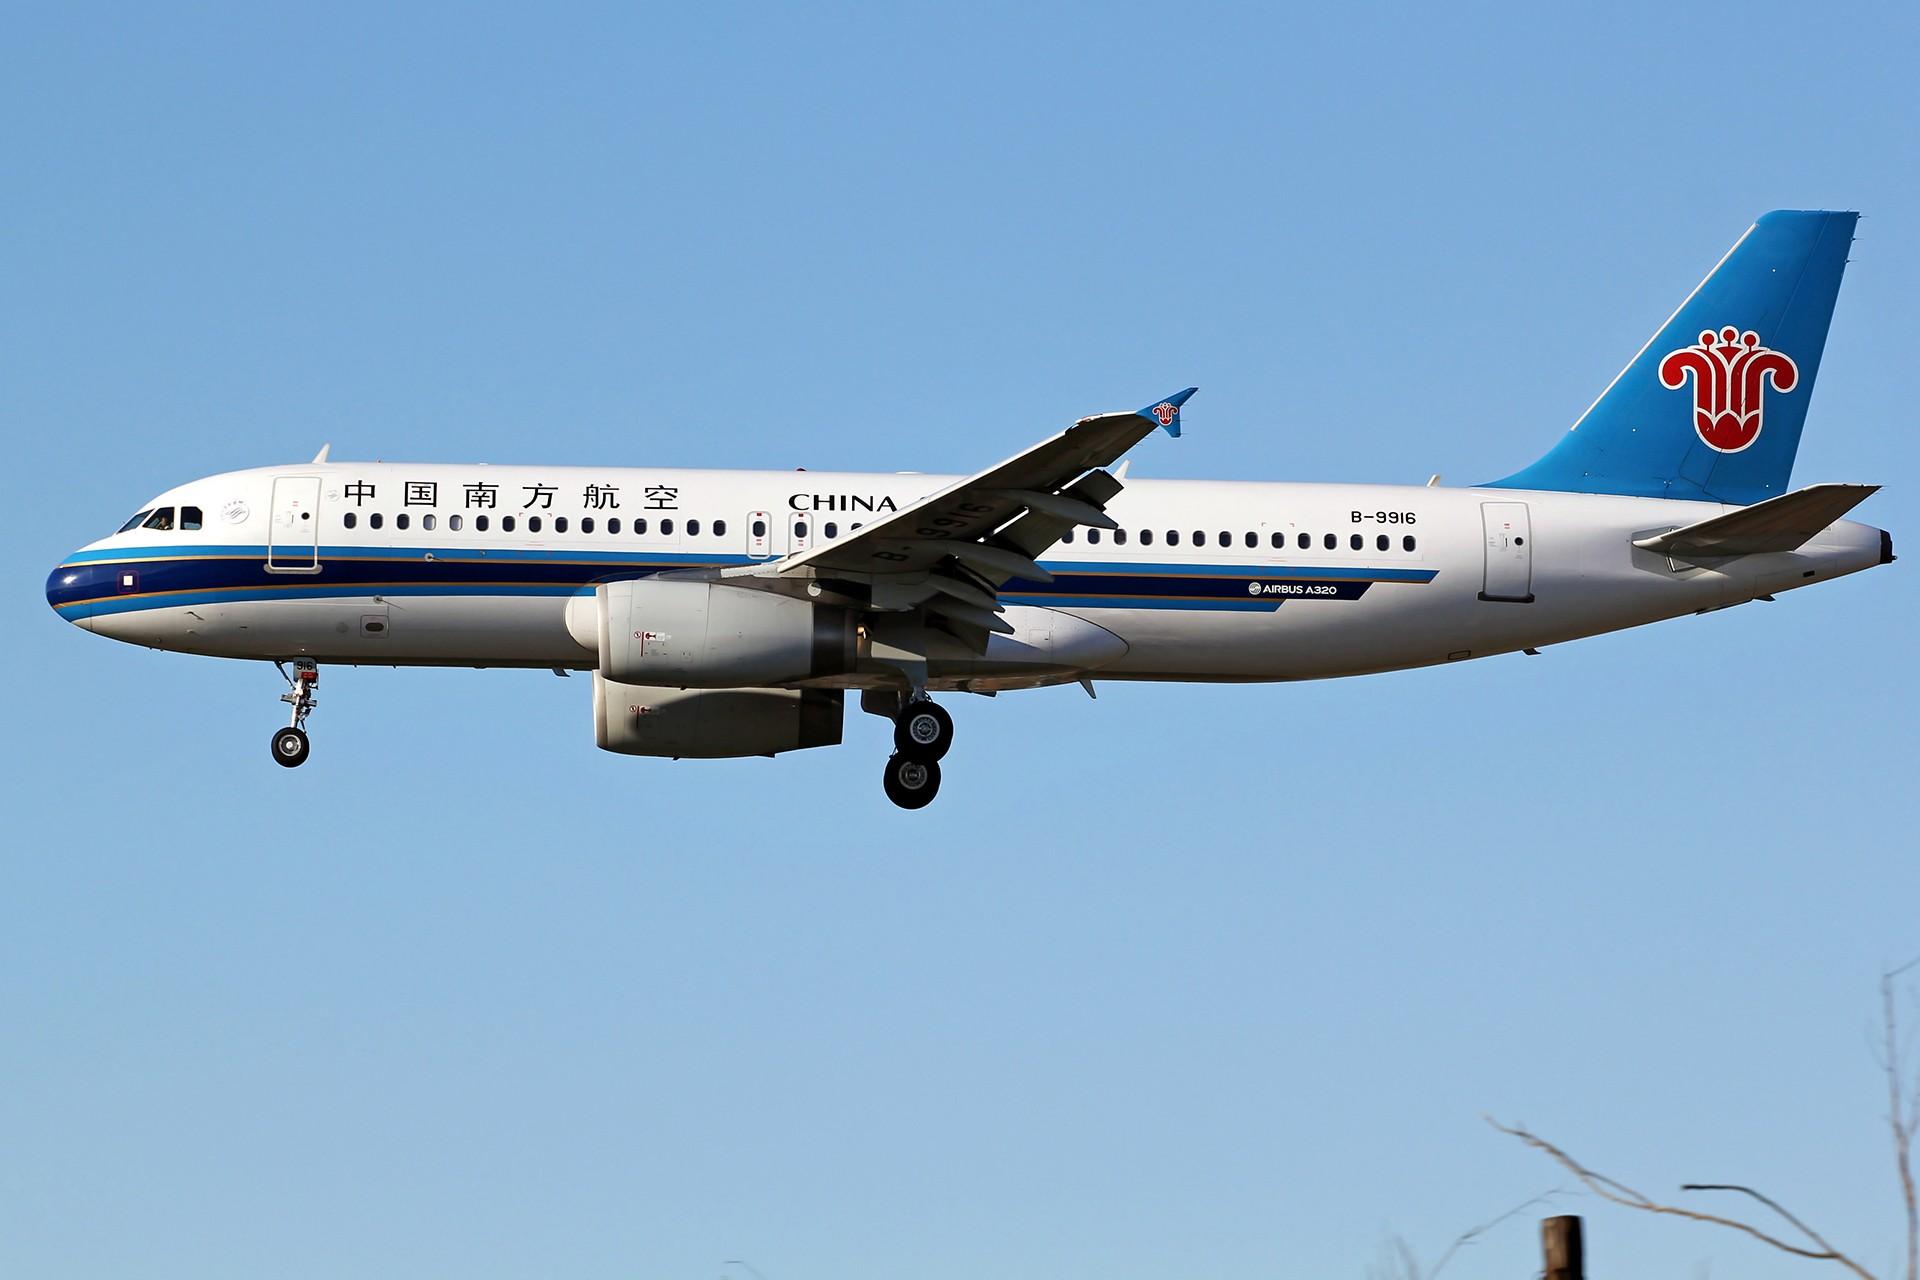 Re:[原创][DLC]。。。降落一组。。。 AIRBUS A320-200 B-9916 中国大连国际机场